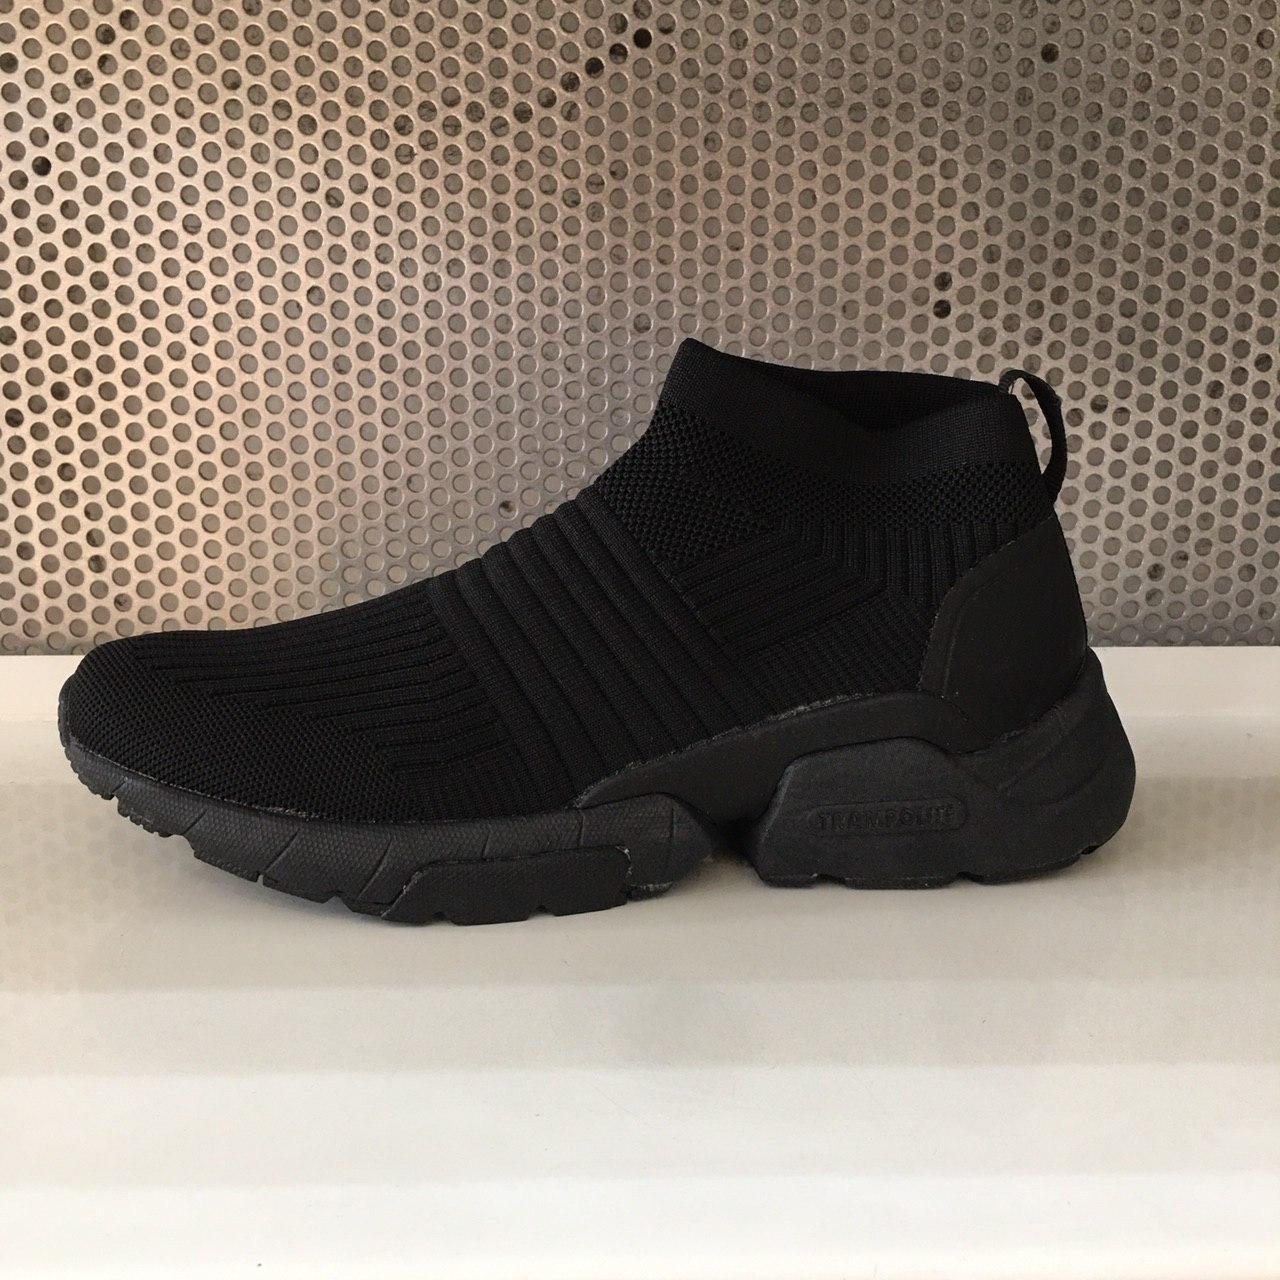 World Balance ODYSSEY 2.0 Men's Shoes